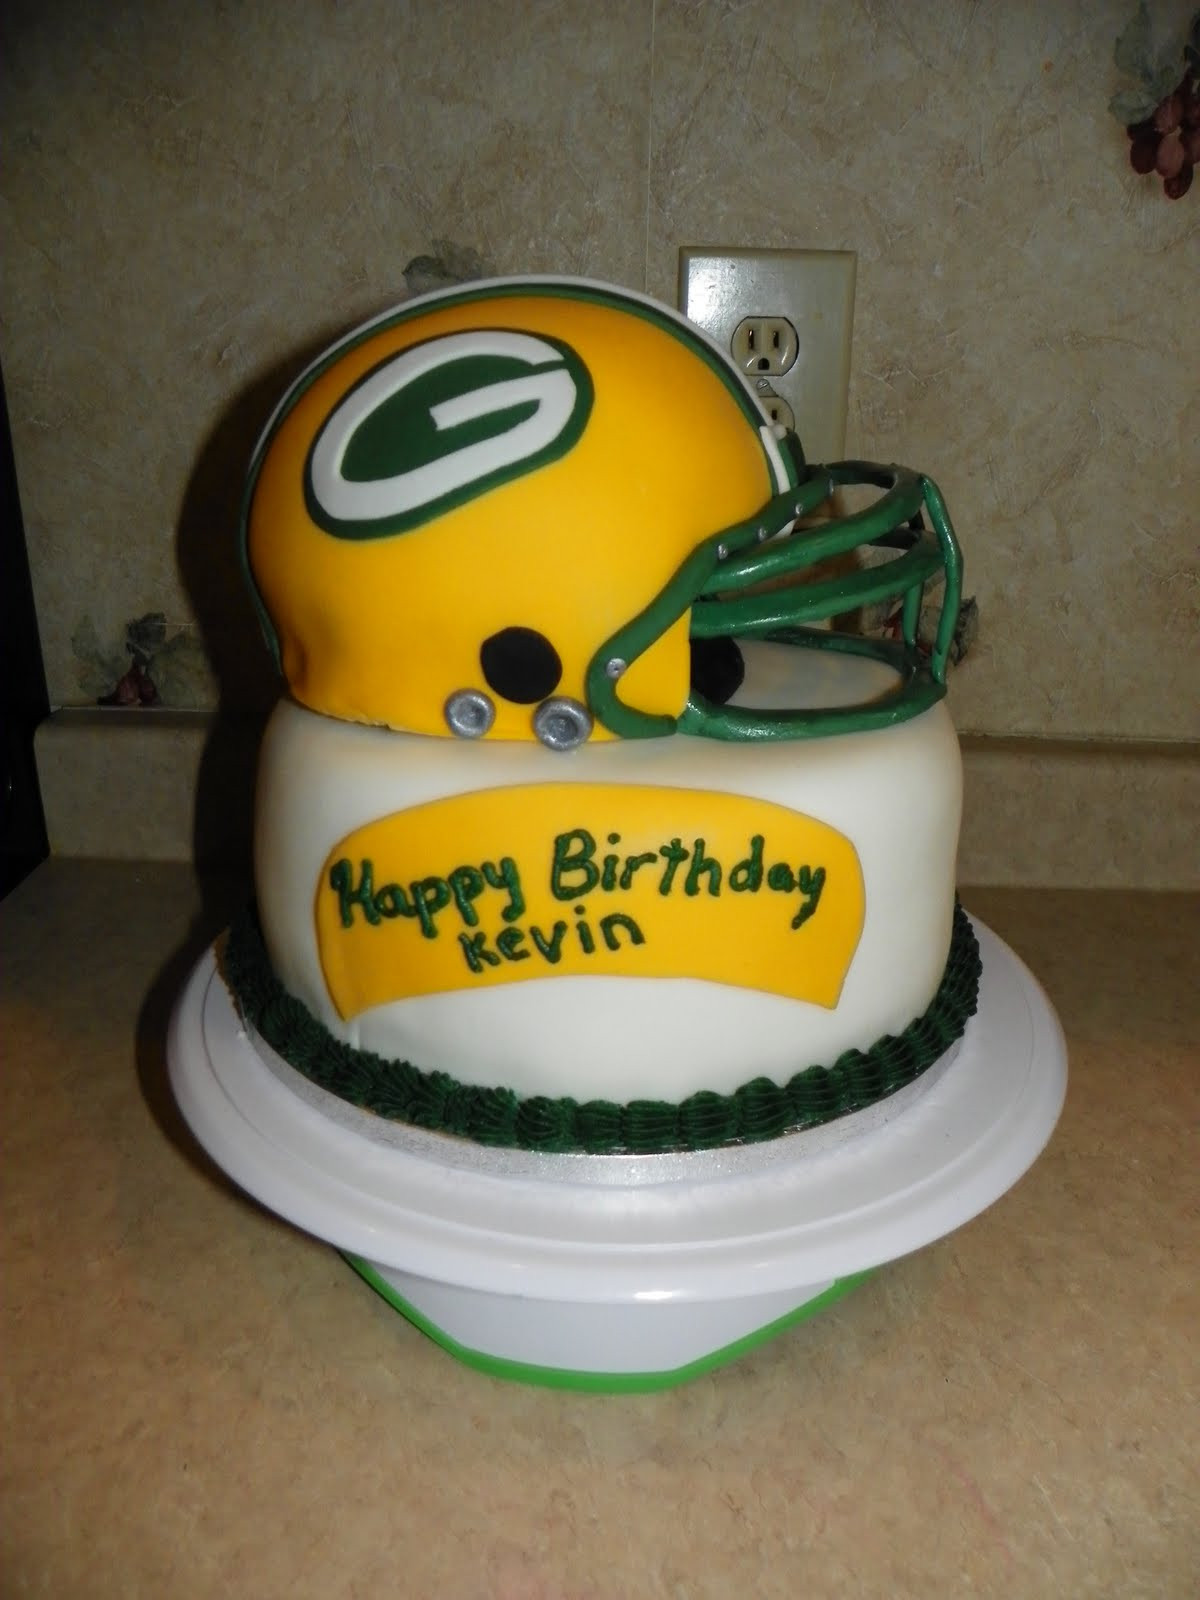 Green Bay Wedding Cakes  MAV Cakes Men s Cakes